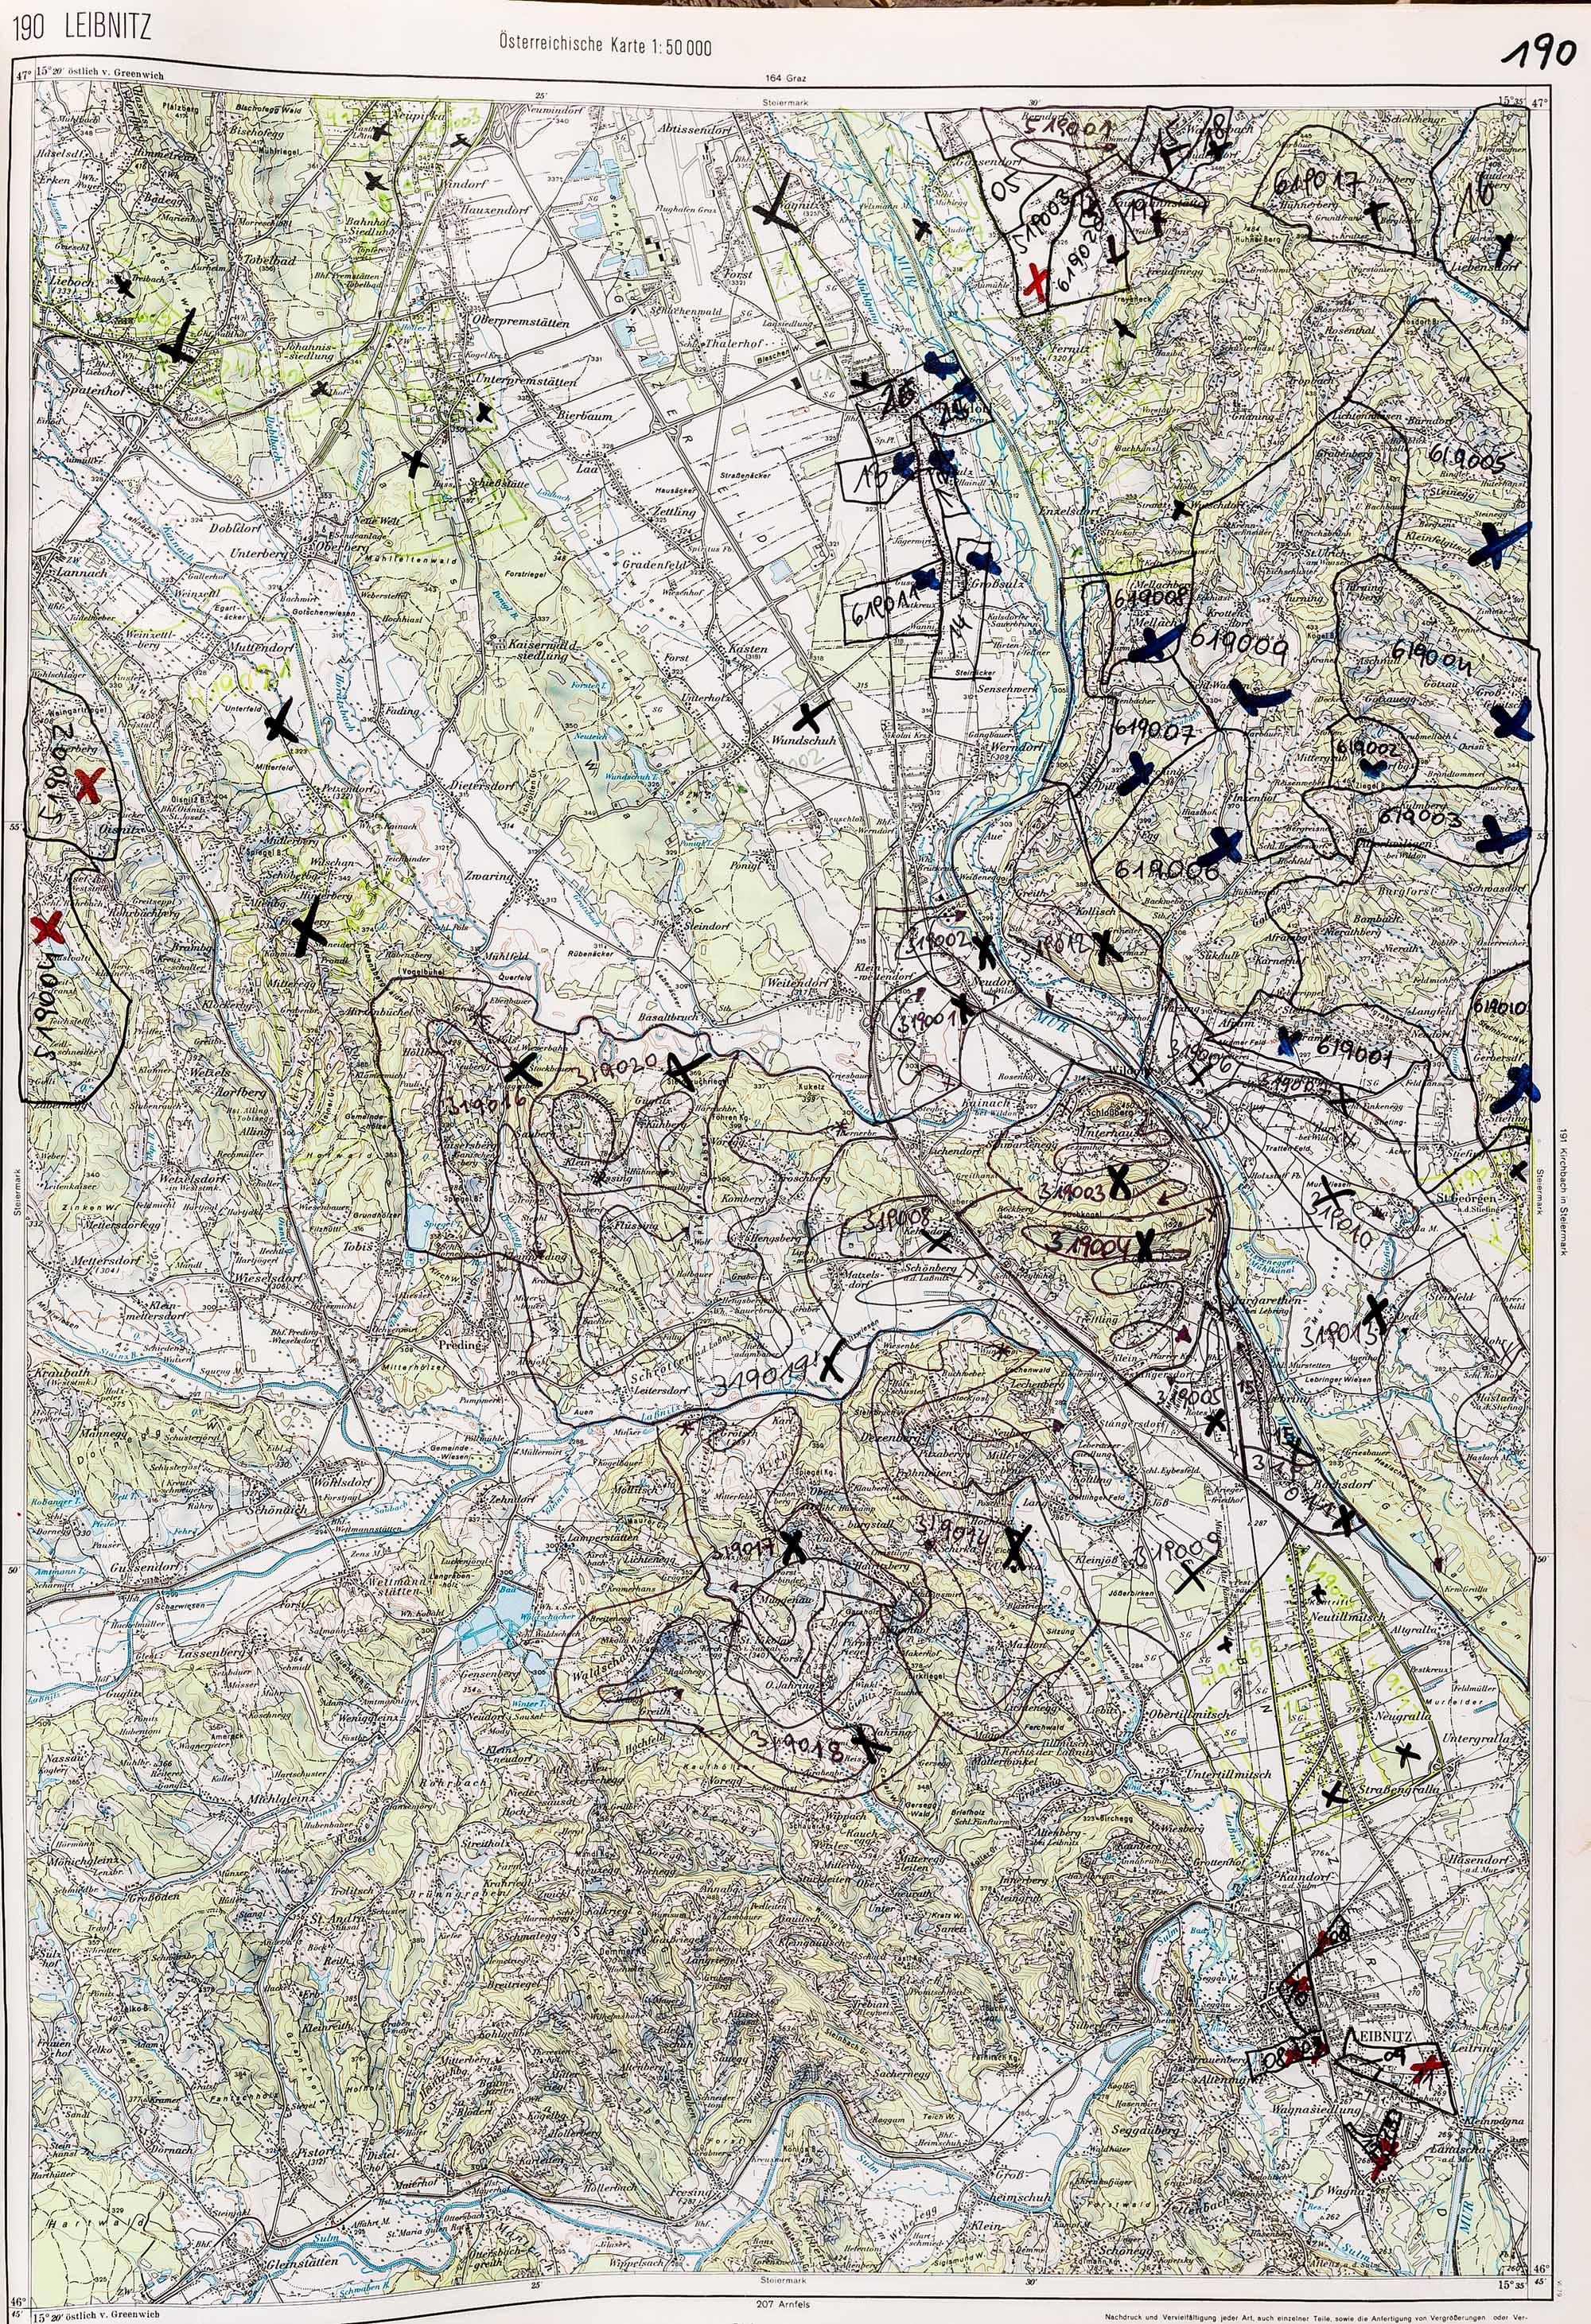 1983-1986 Karte 190